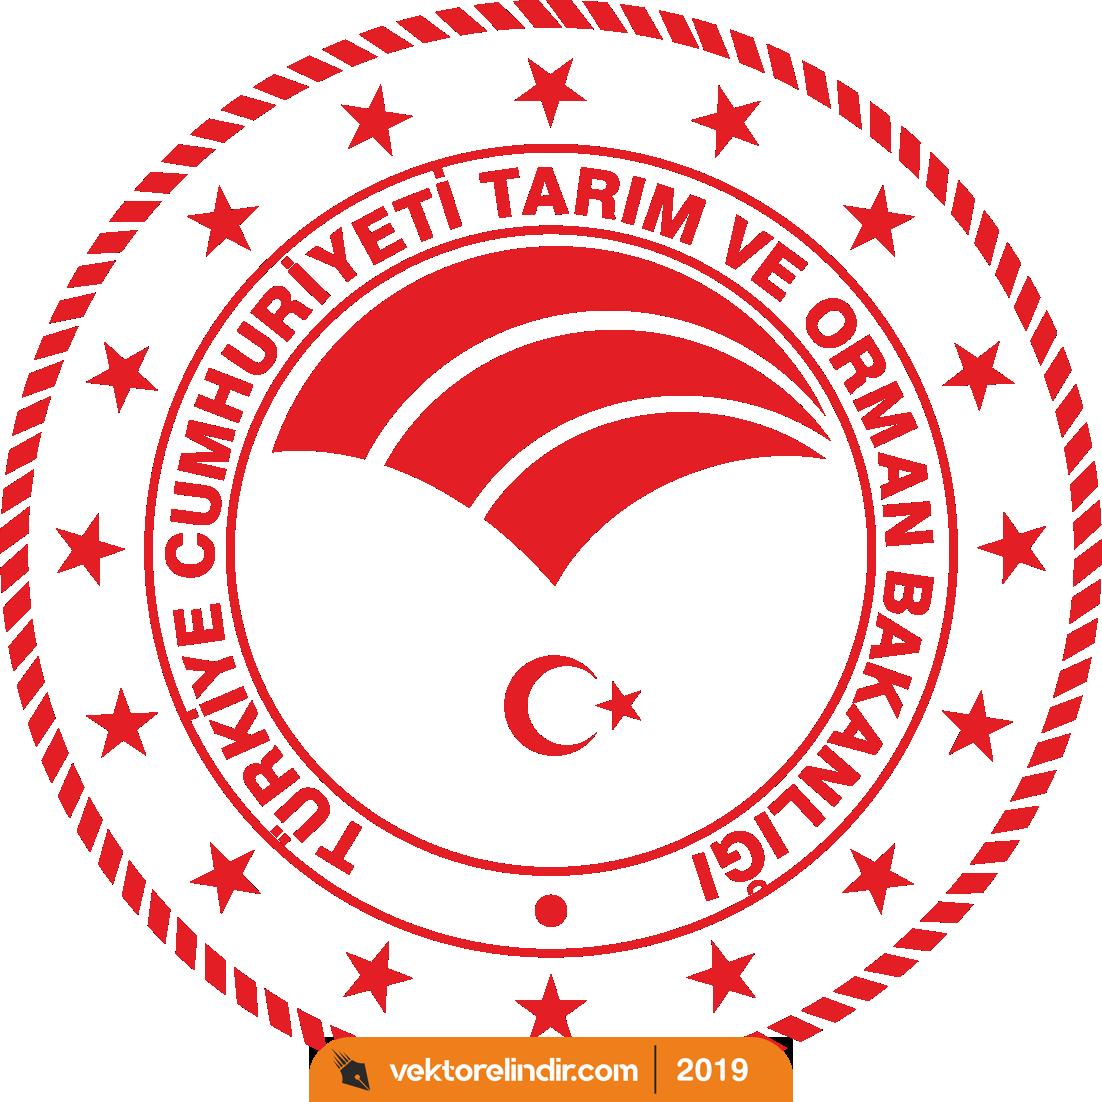 t c tarim ve orman bakanligi yeni logo vektorel vektorelindir com